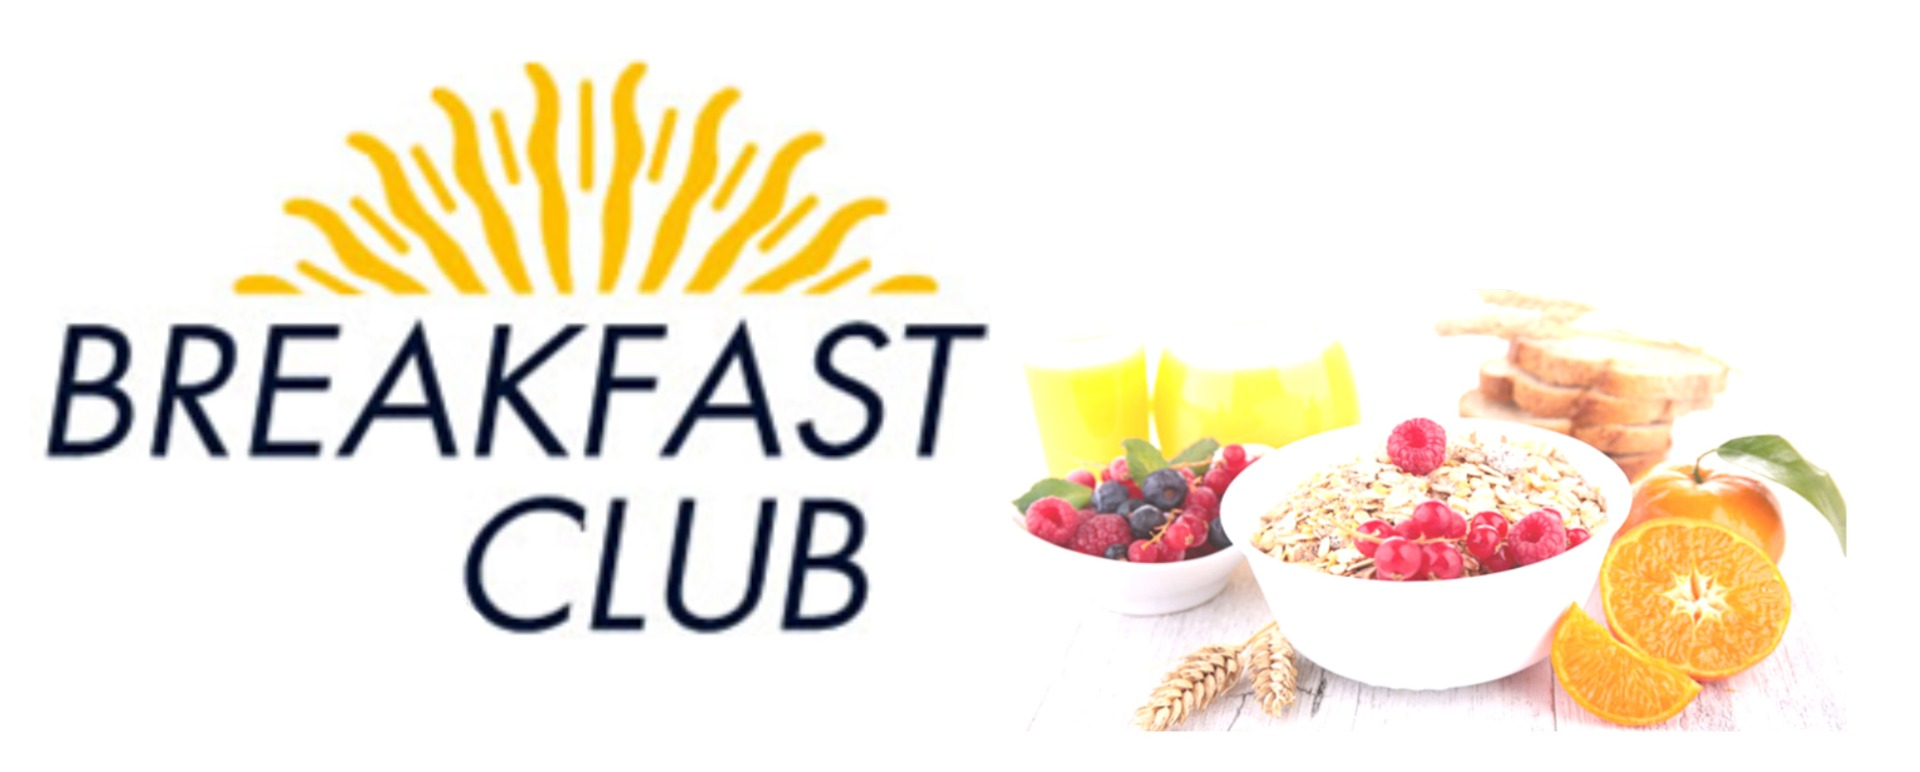 Breakfast Club31.jpg